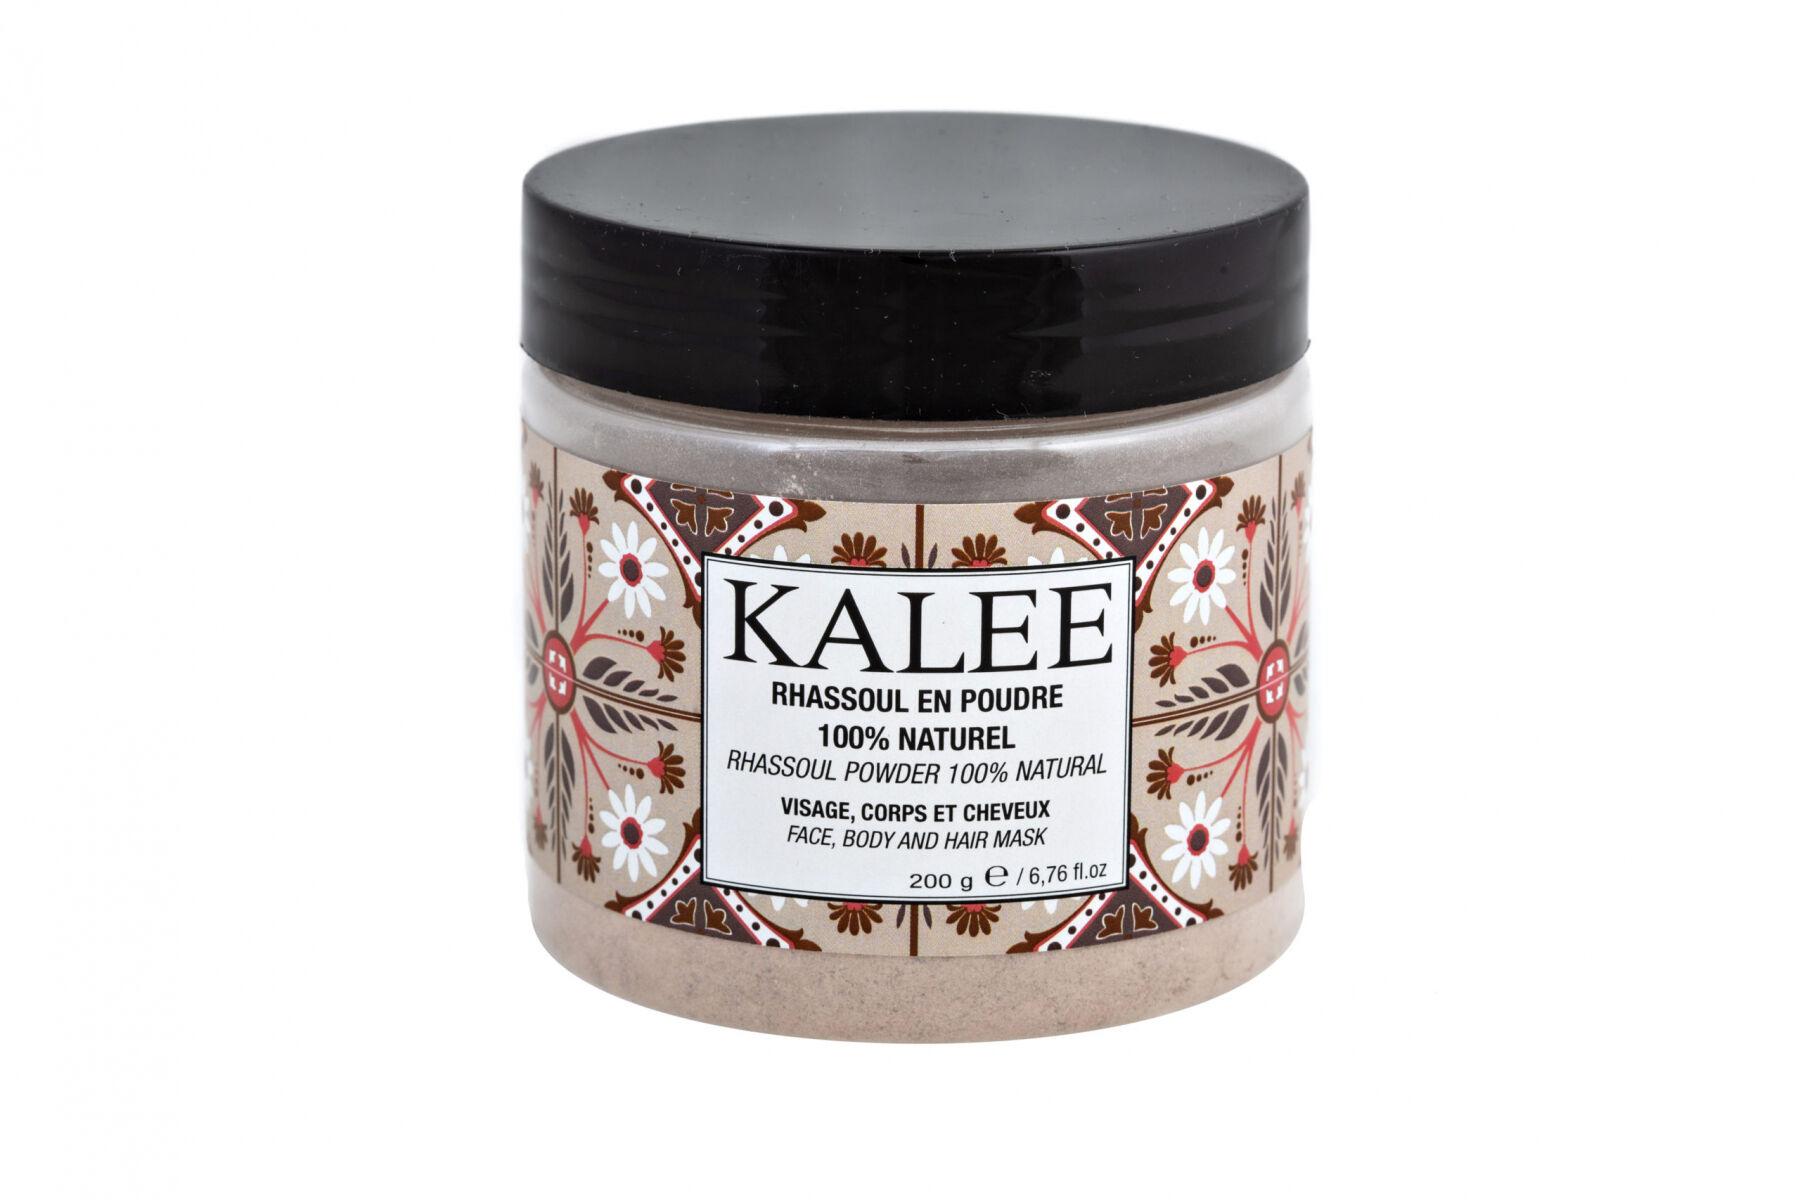 Kalee Beauty Rhassoul en poudre 100% naturel